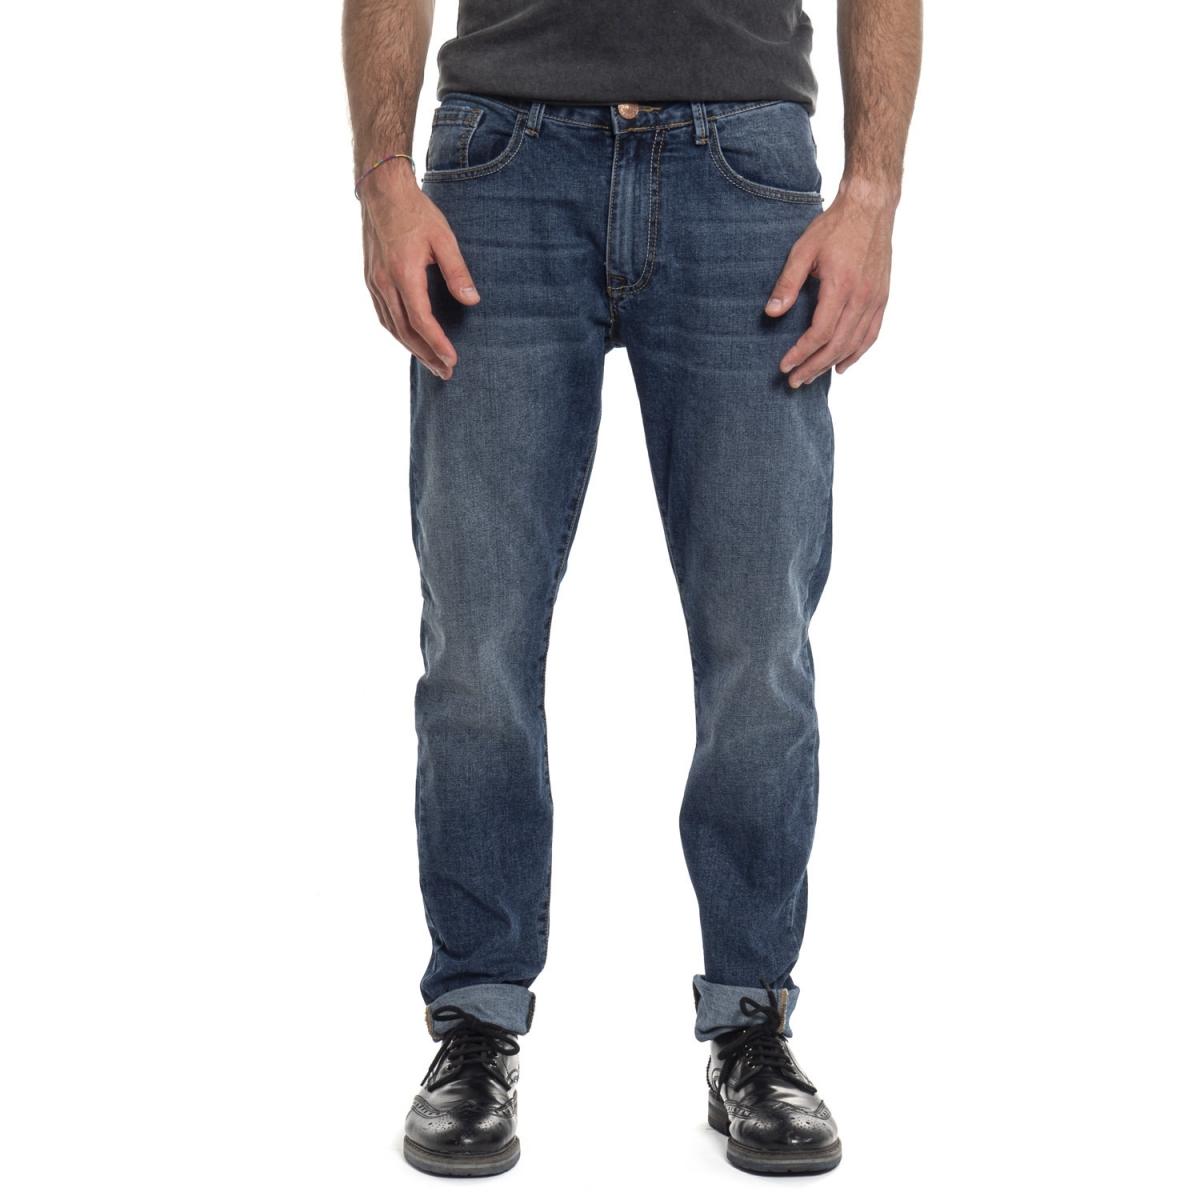 clothing Denim men Jeans ATM1088-8 LANDEK PARK Cafedelmar Shop